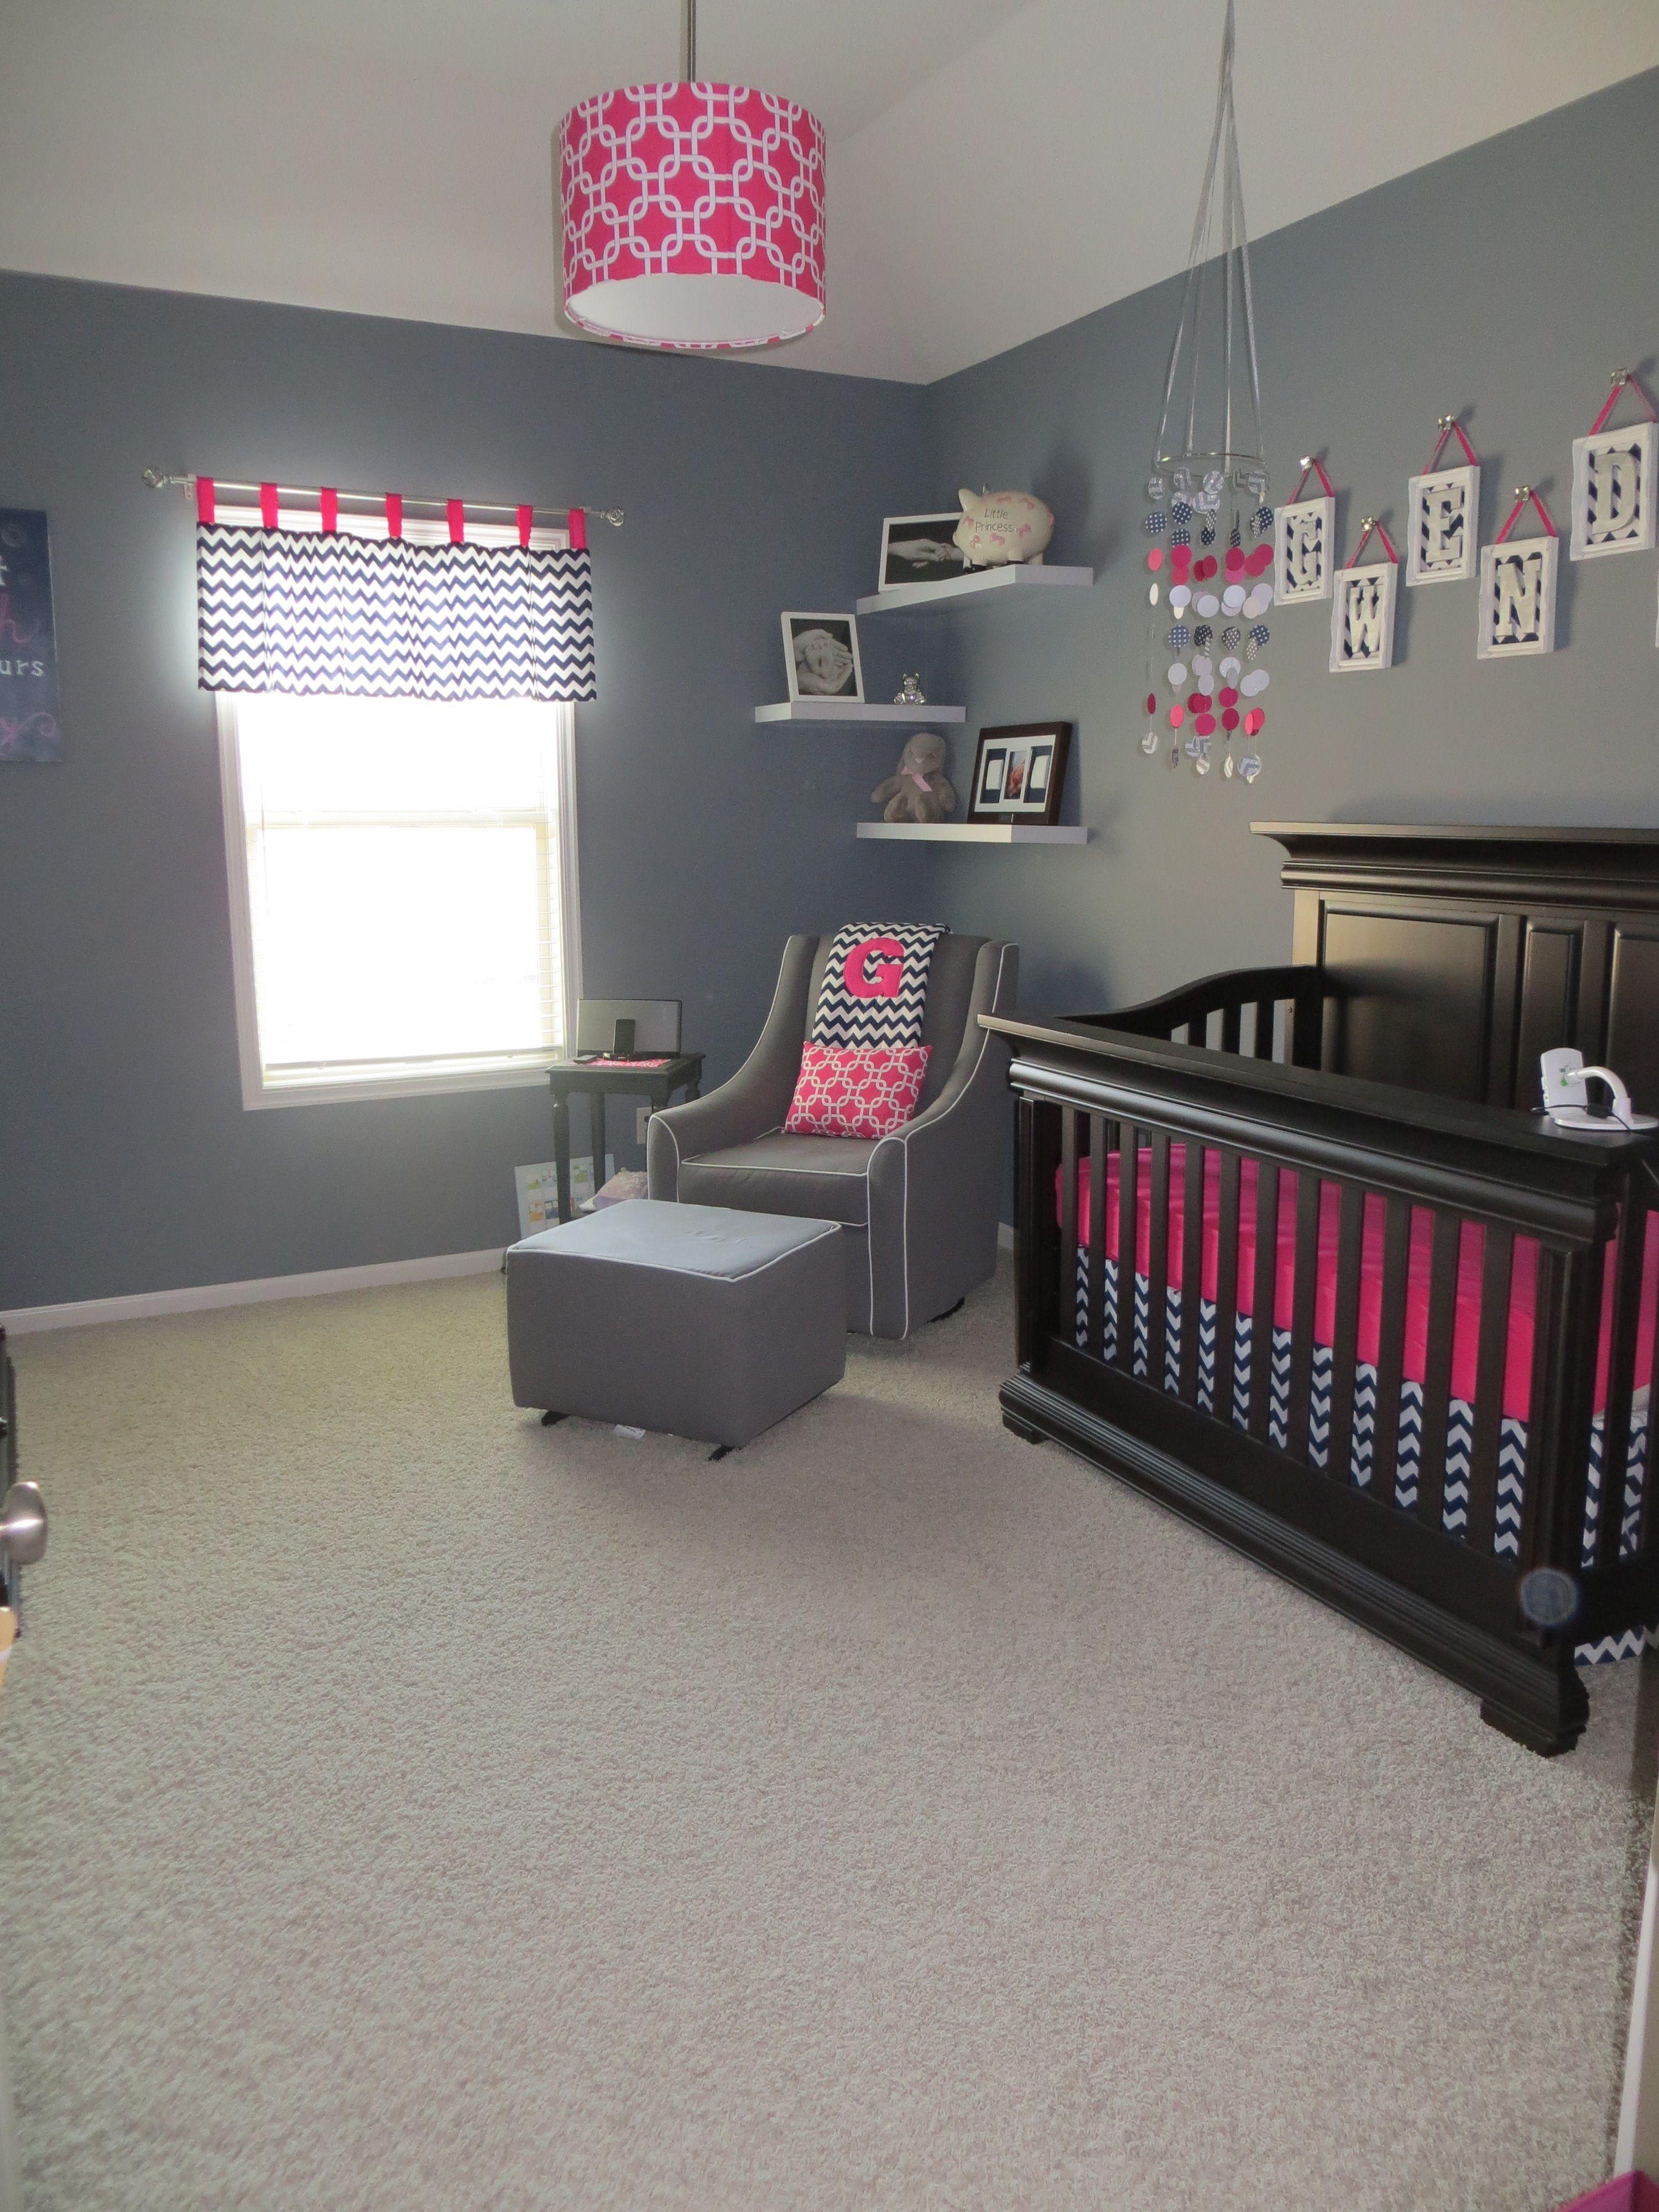 Fan Of Navy And Hot Pink Girl Room Baby Room Decor Nursery Room